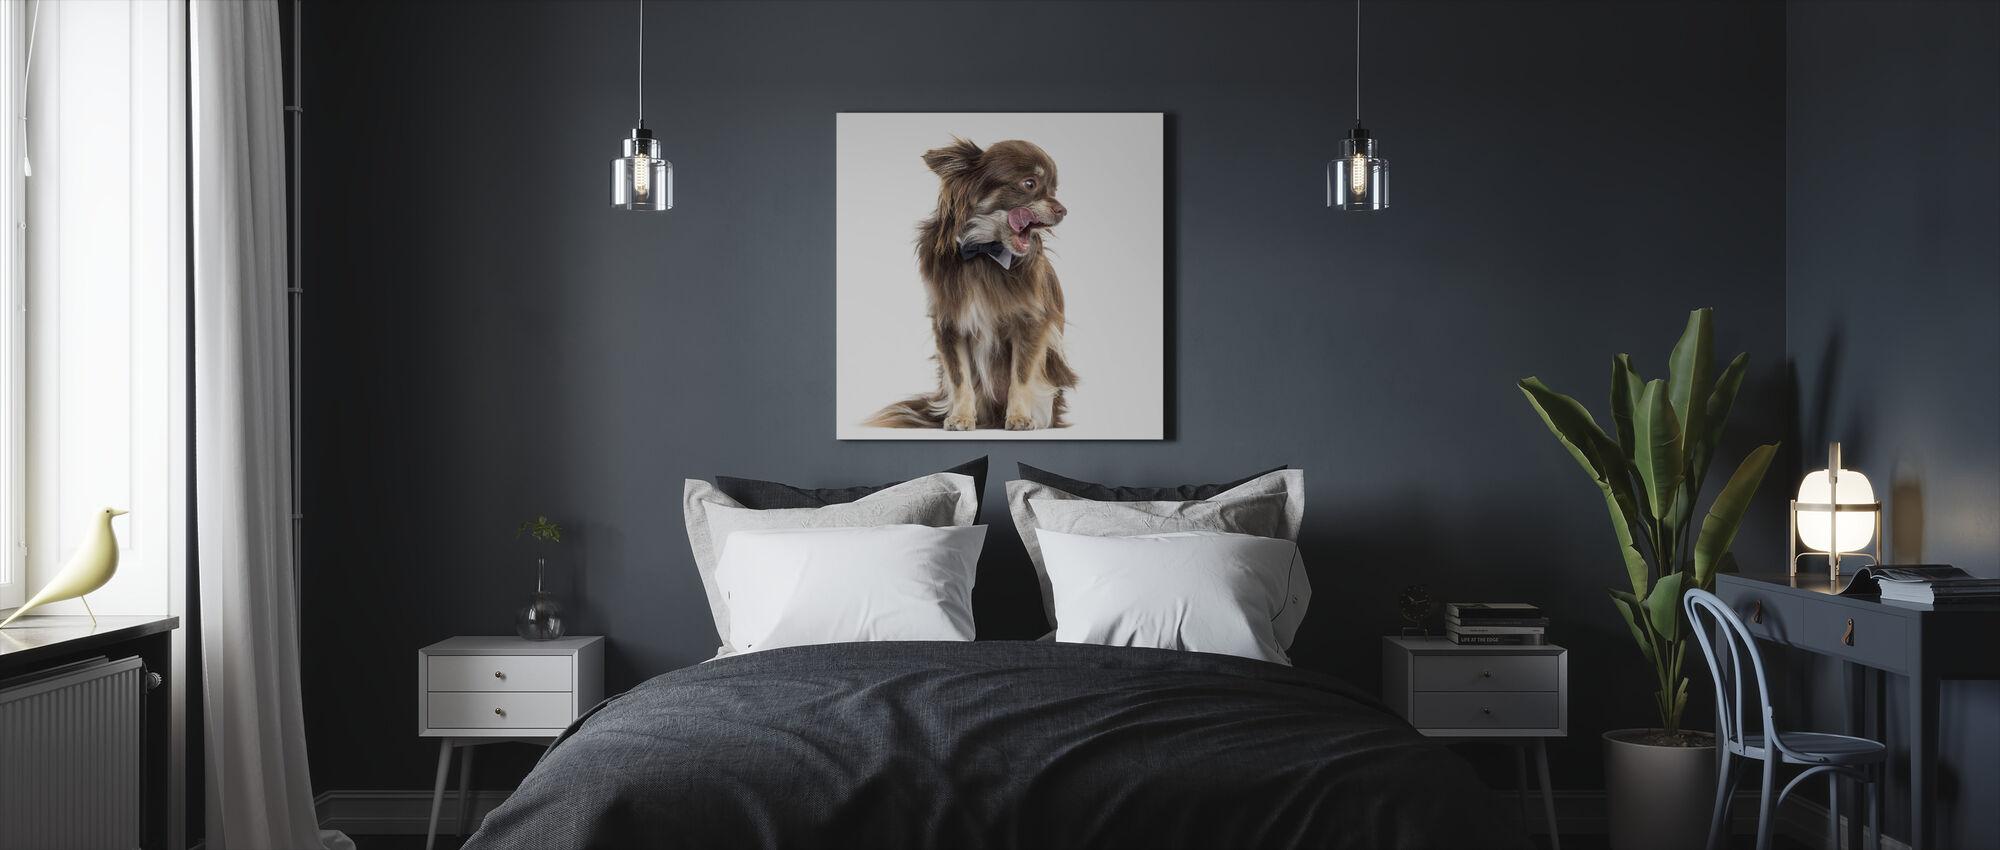 Chihuahua - Canvastaulu - Makuuhuone